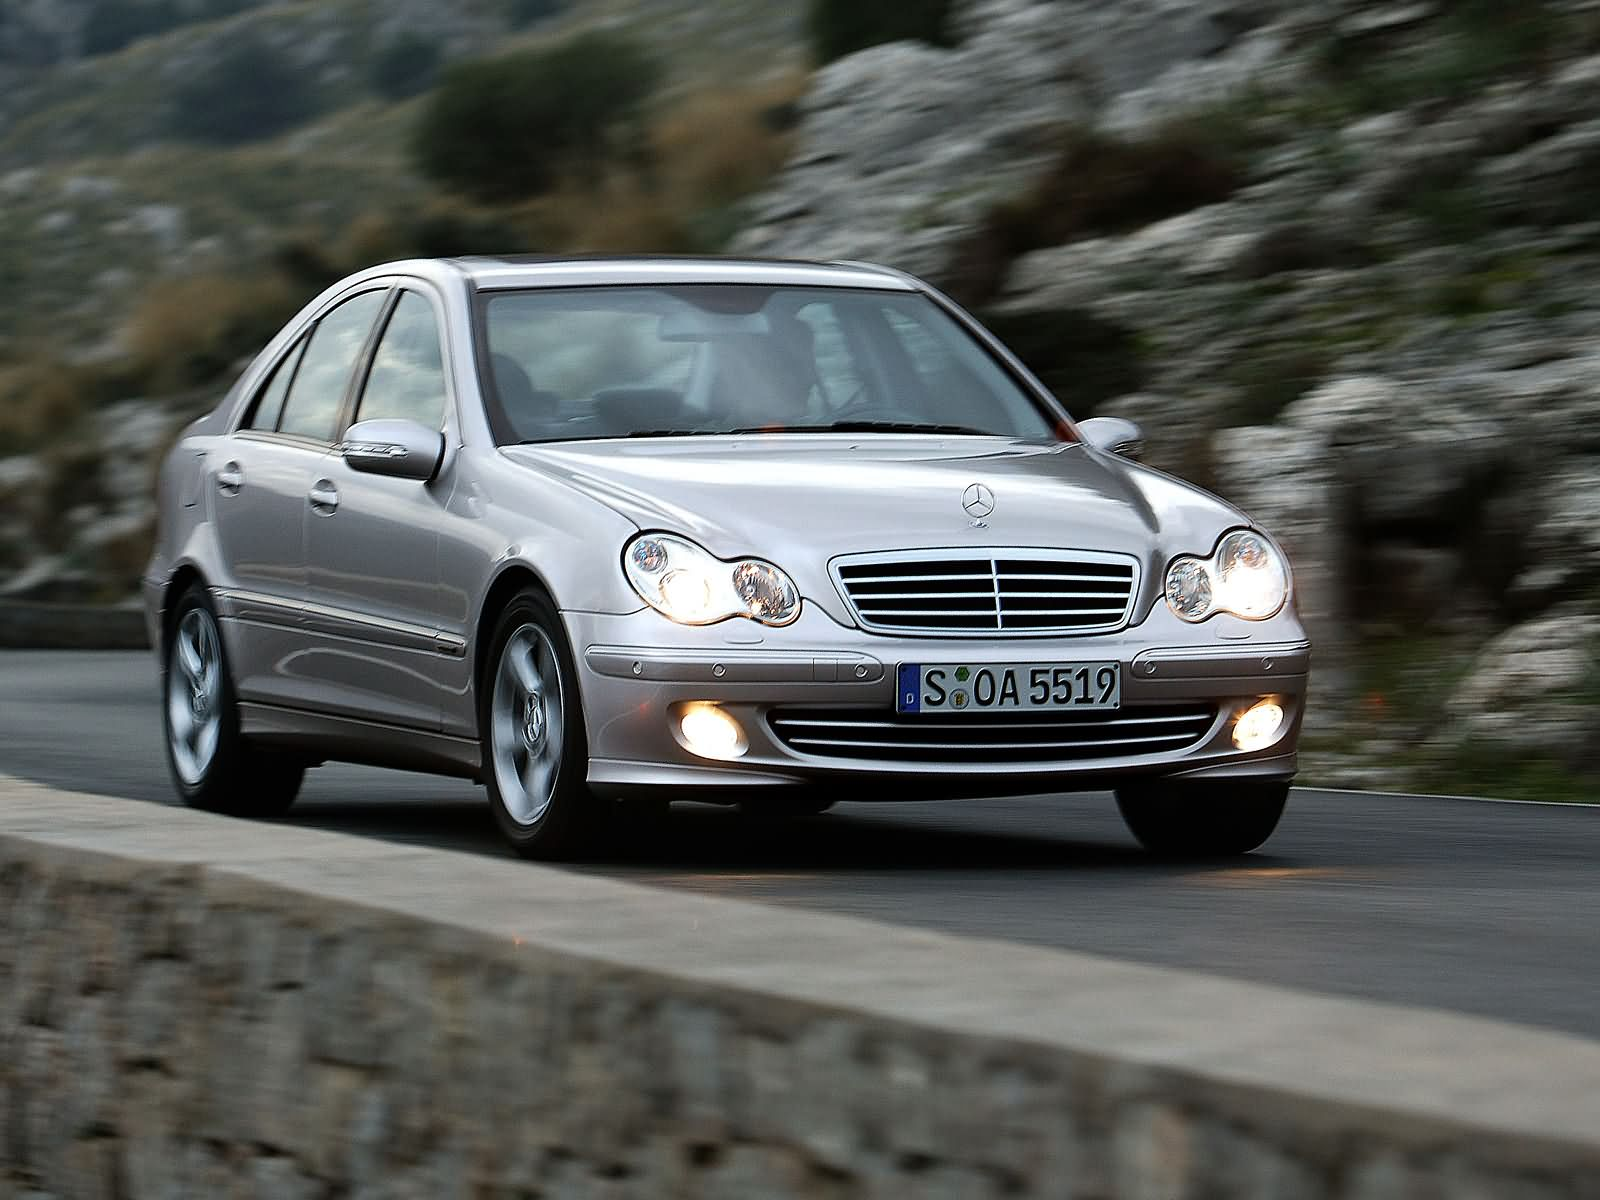 Mercedes-Benz C-Class W203 picture #10829 | Mercedes-Benz photo ...